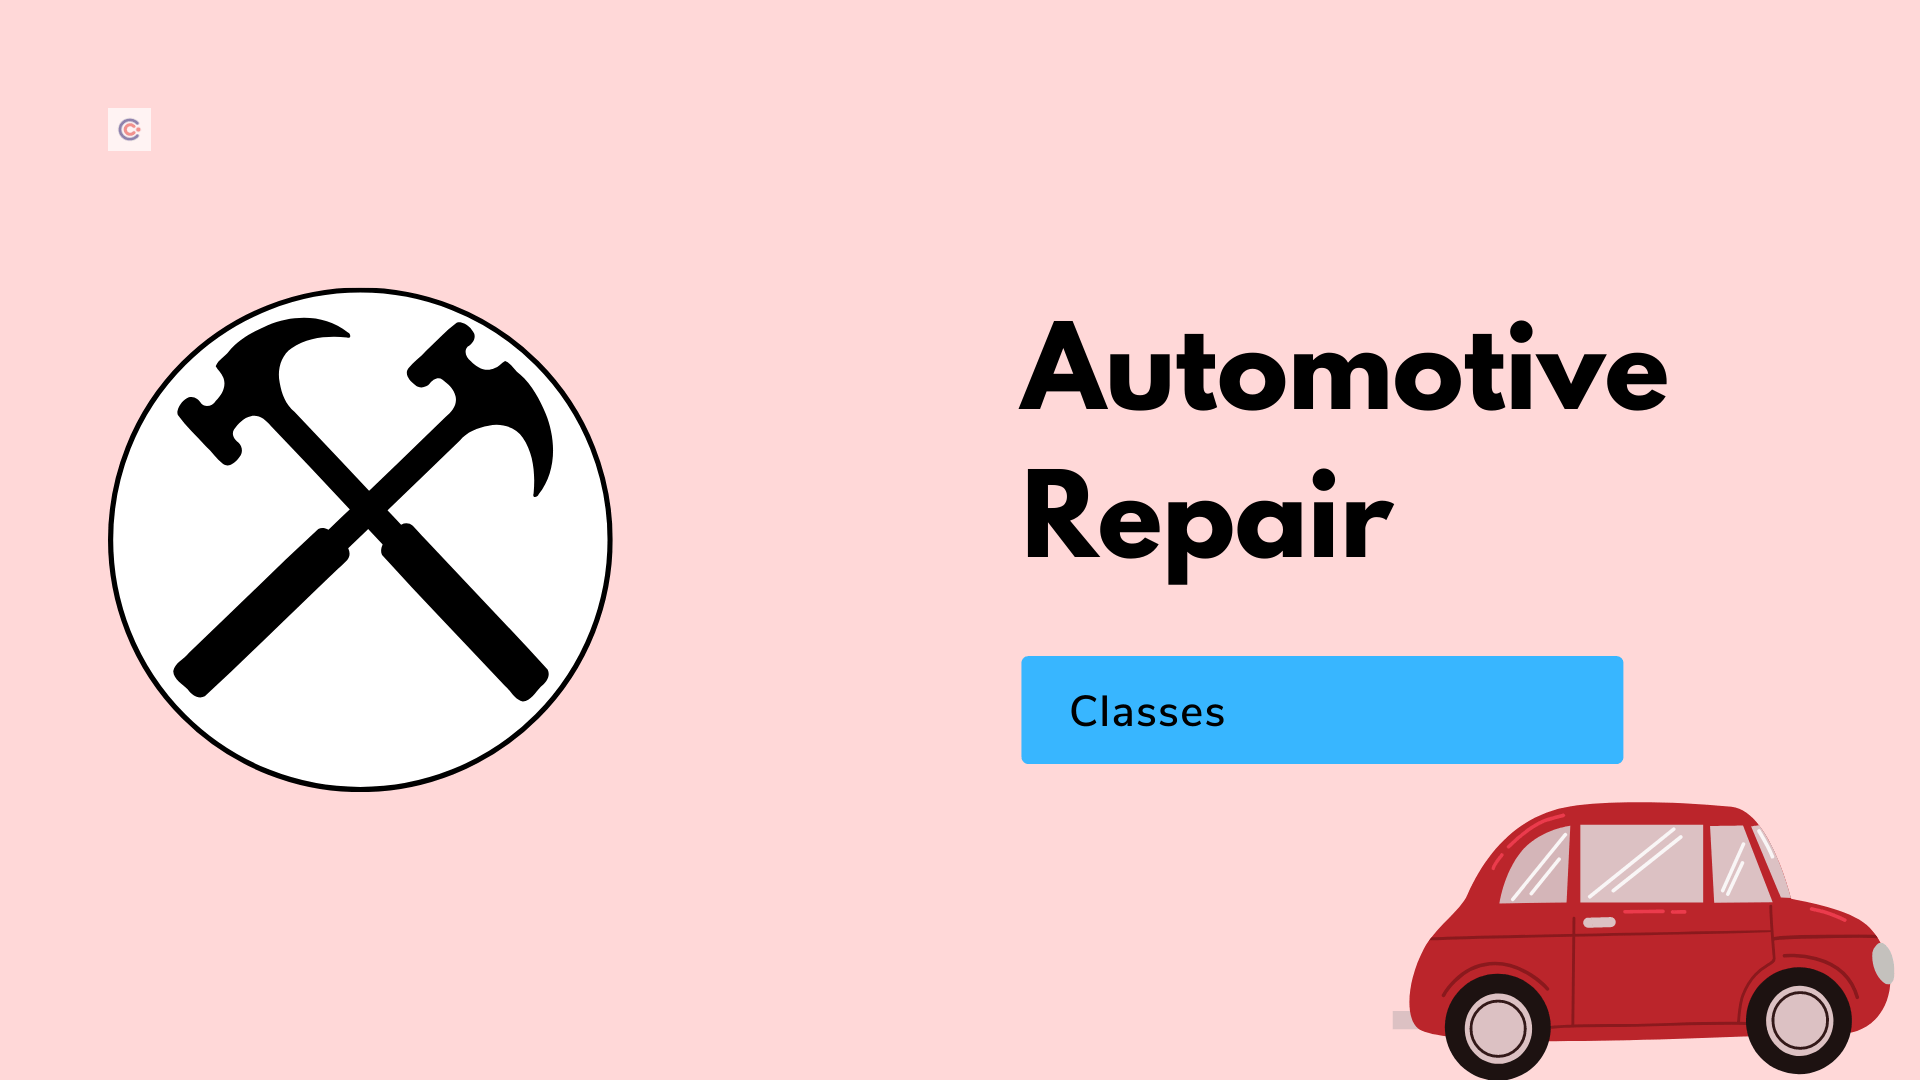 5 Best Automotive Repair Classes - Learn Automotive Repairing Online